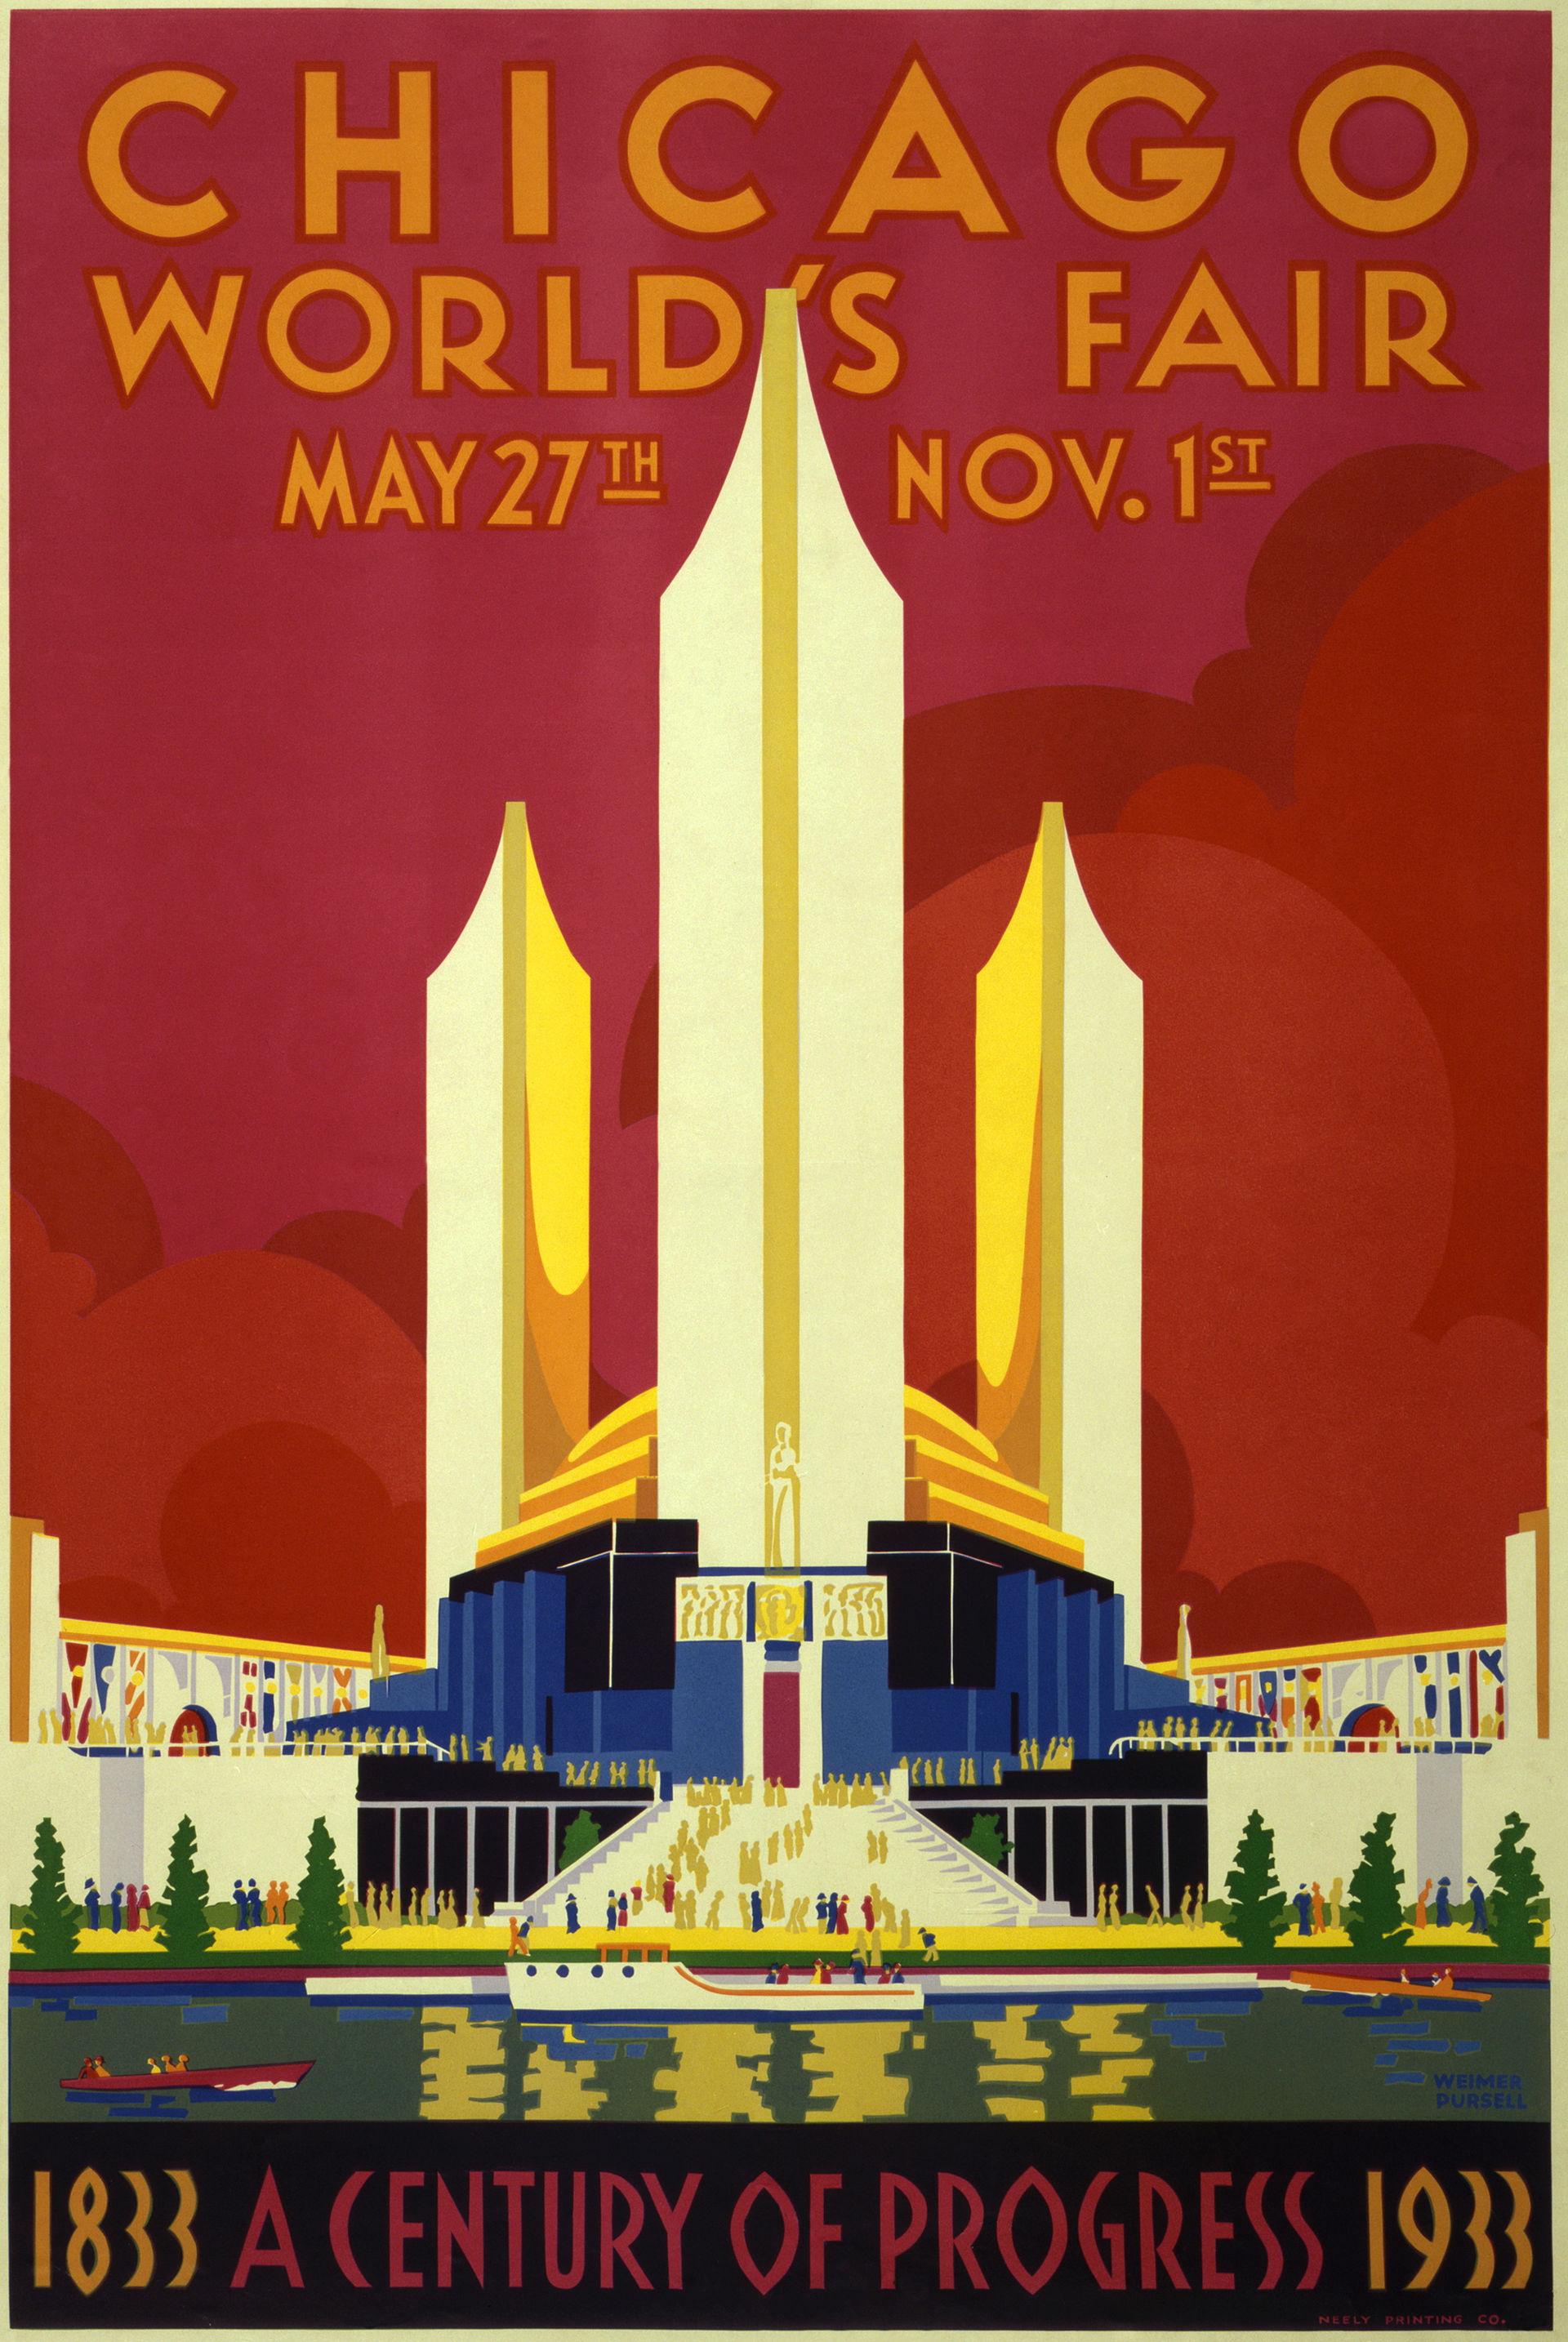 Chicago World's Fair 1933 2